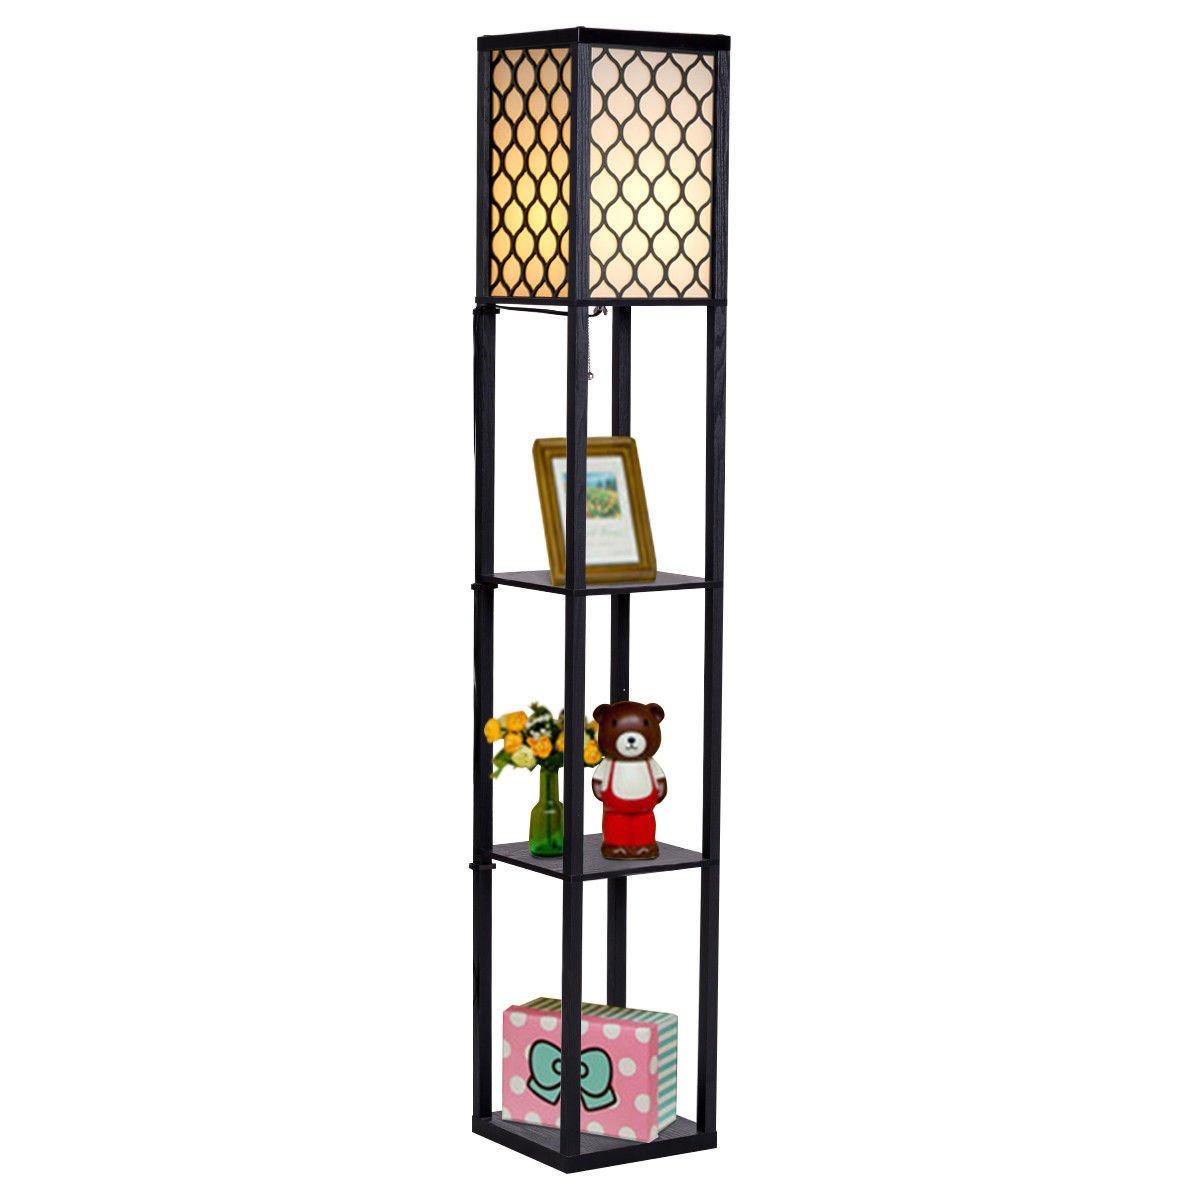 Safstar Modern Shelf Floor Lamp with Shade, 63 Inch Height, 3 Storage Rack Shelves